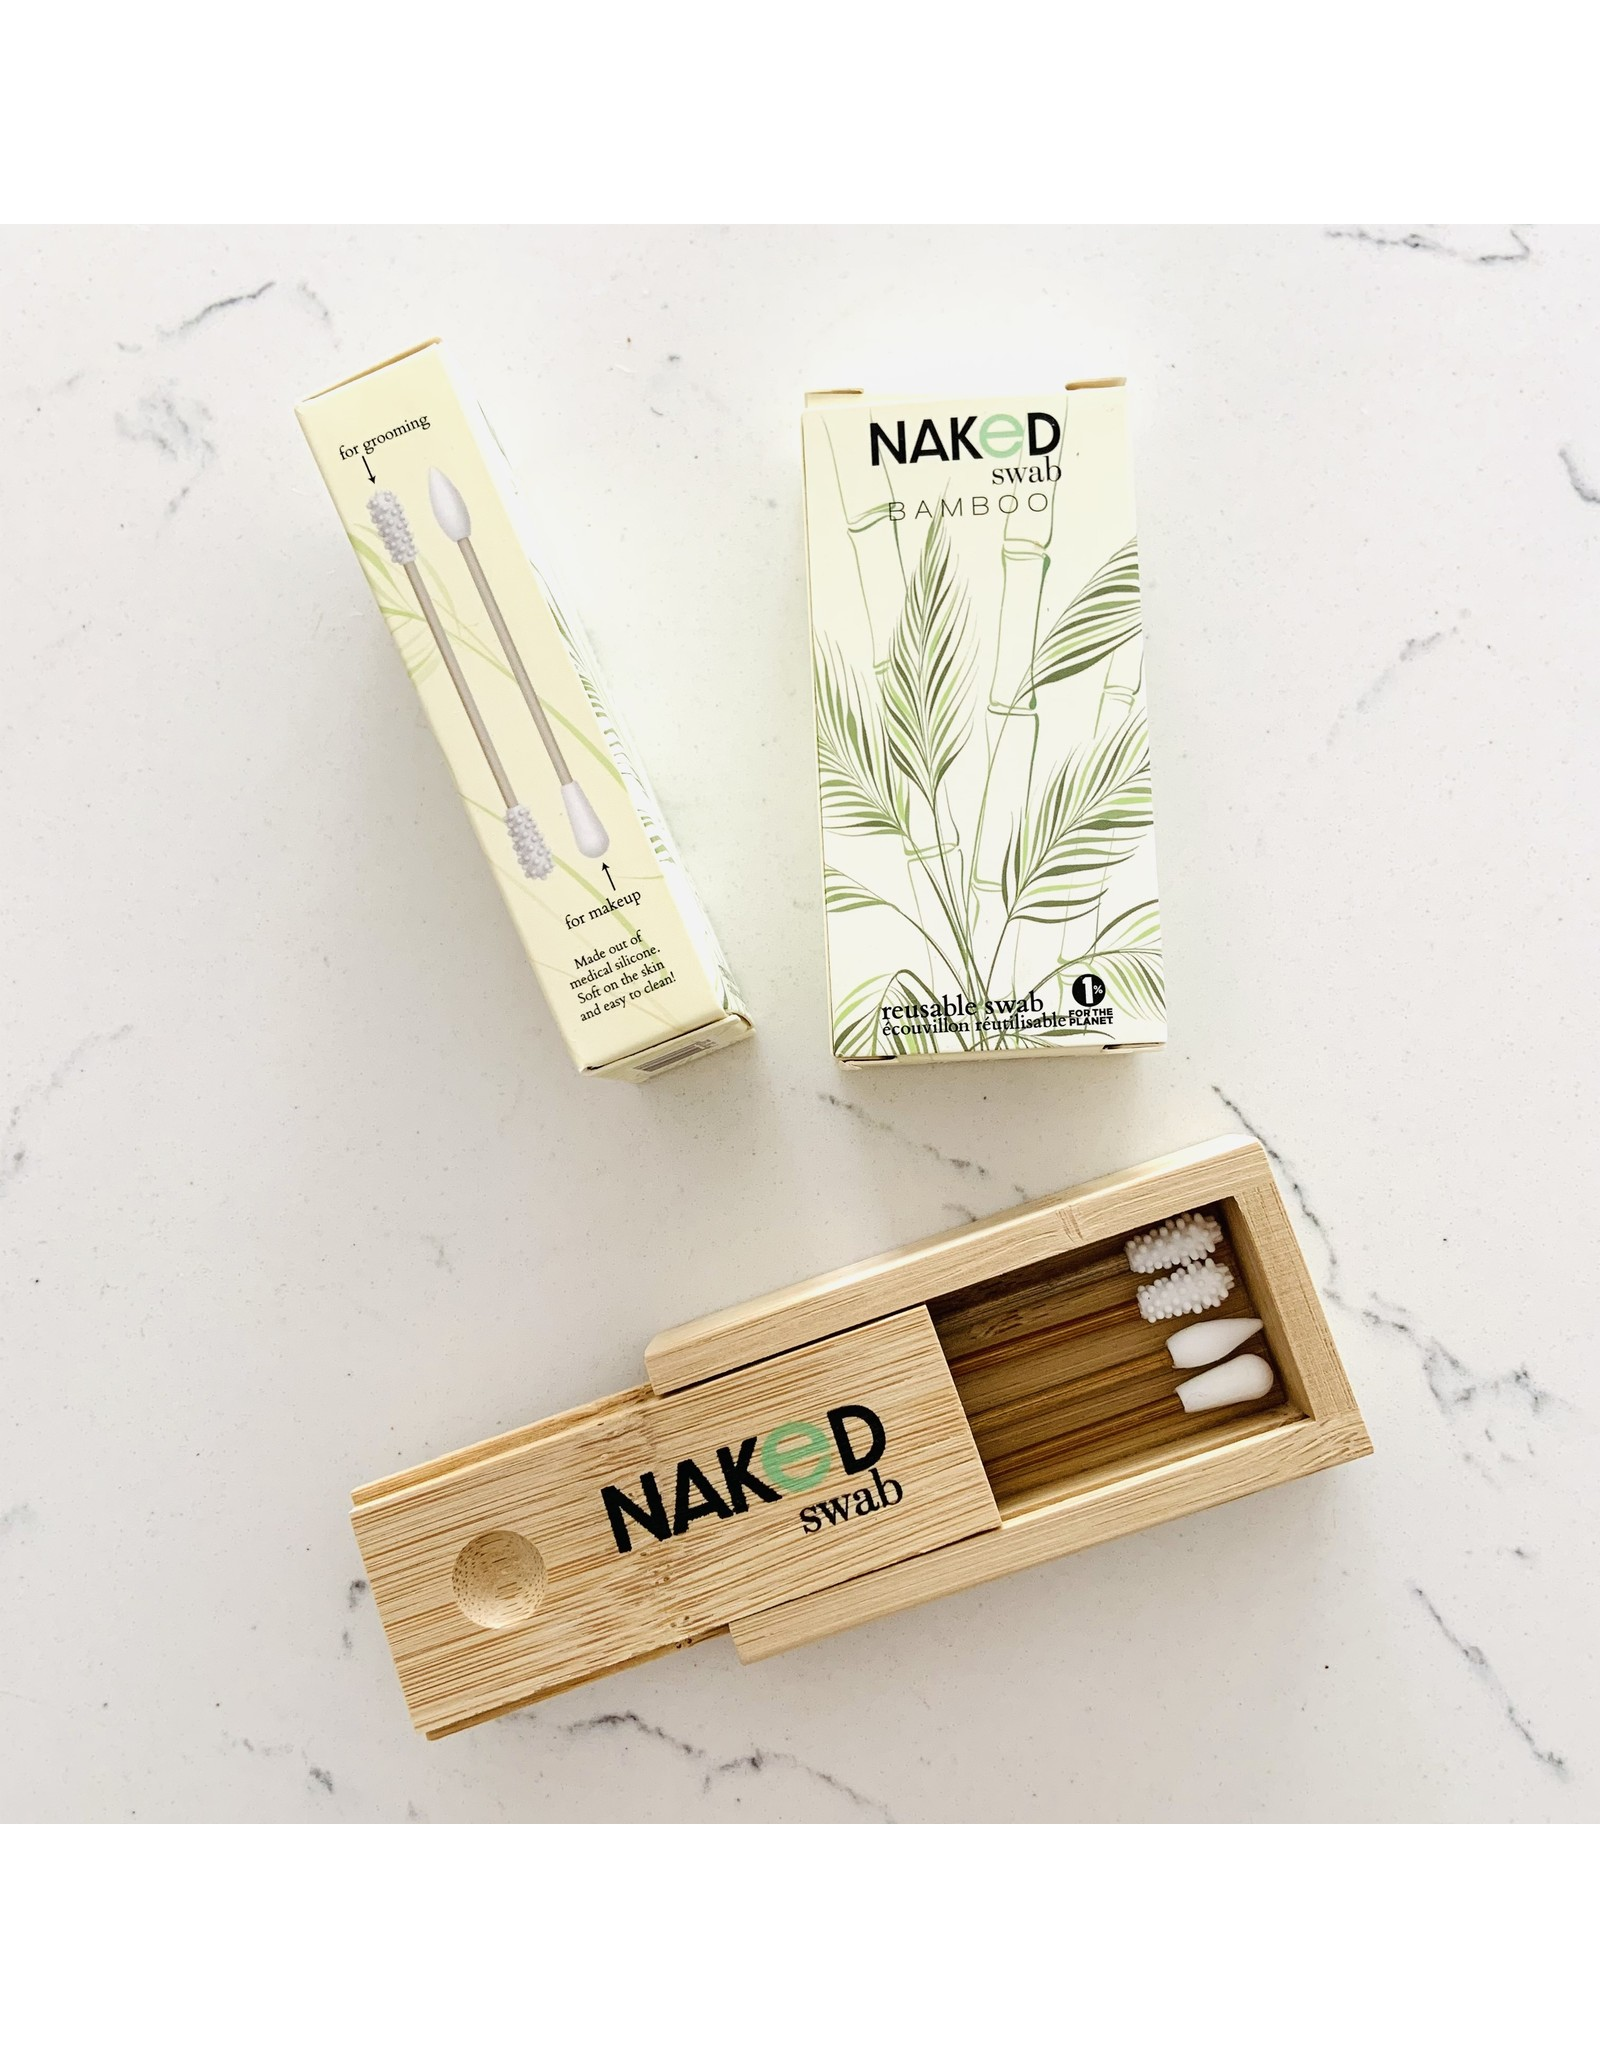 NakedSwab NakedSwab Bamboo and Silicone Swabs